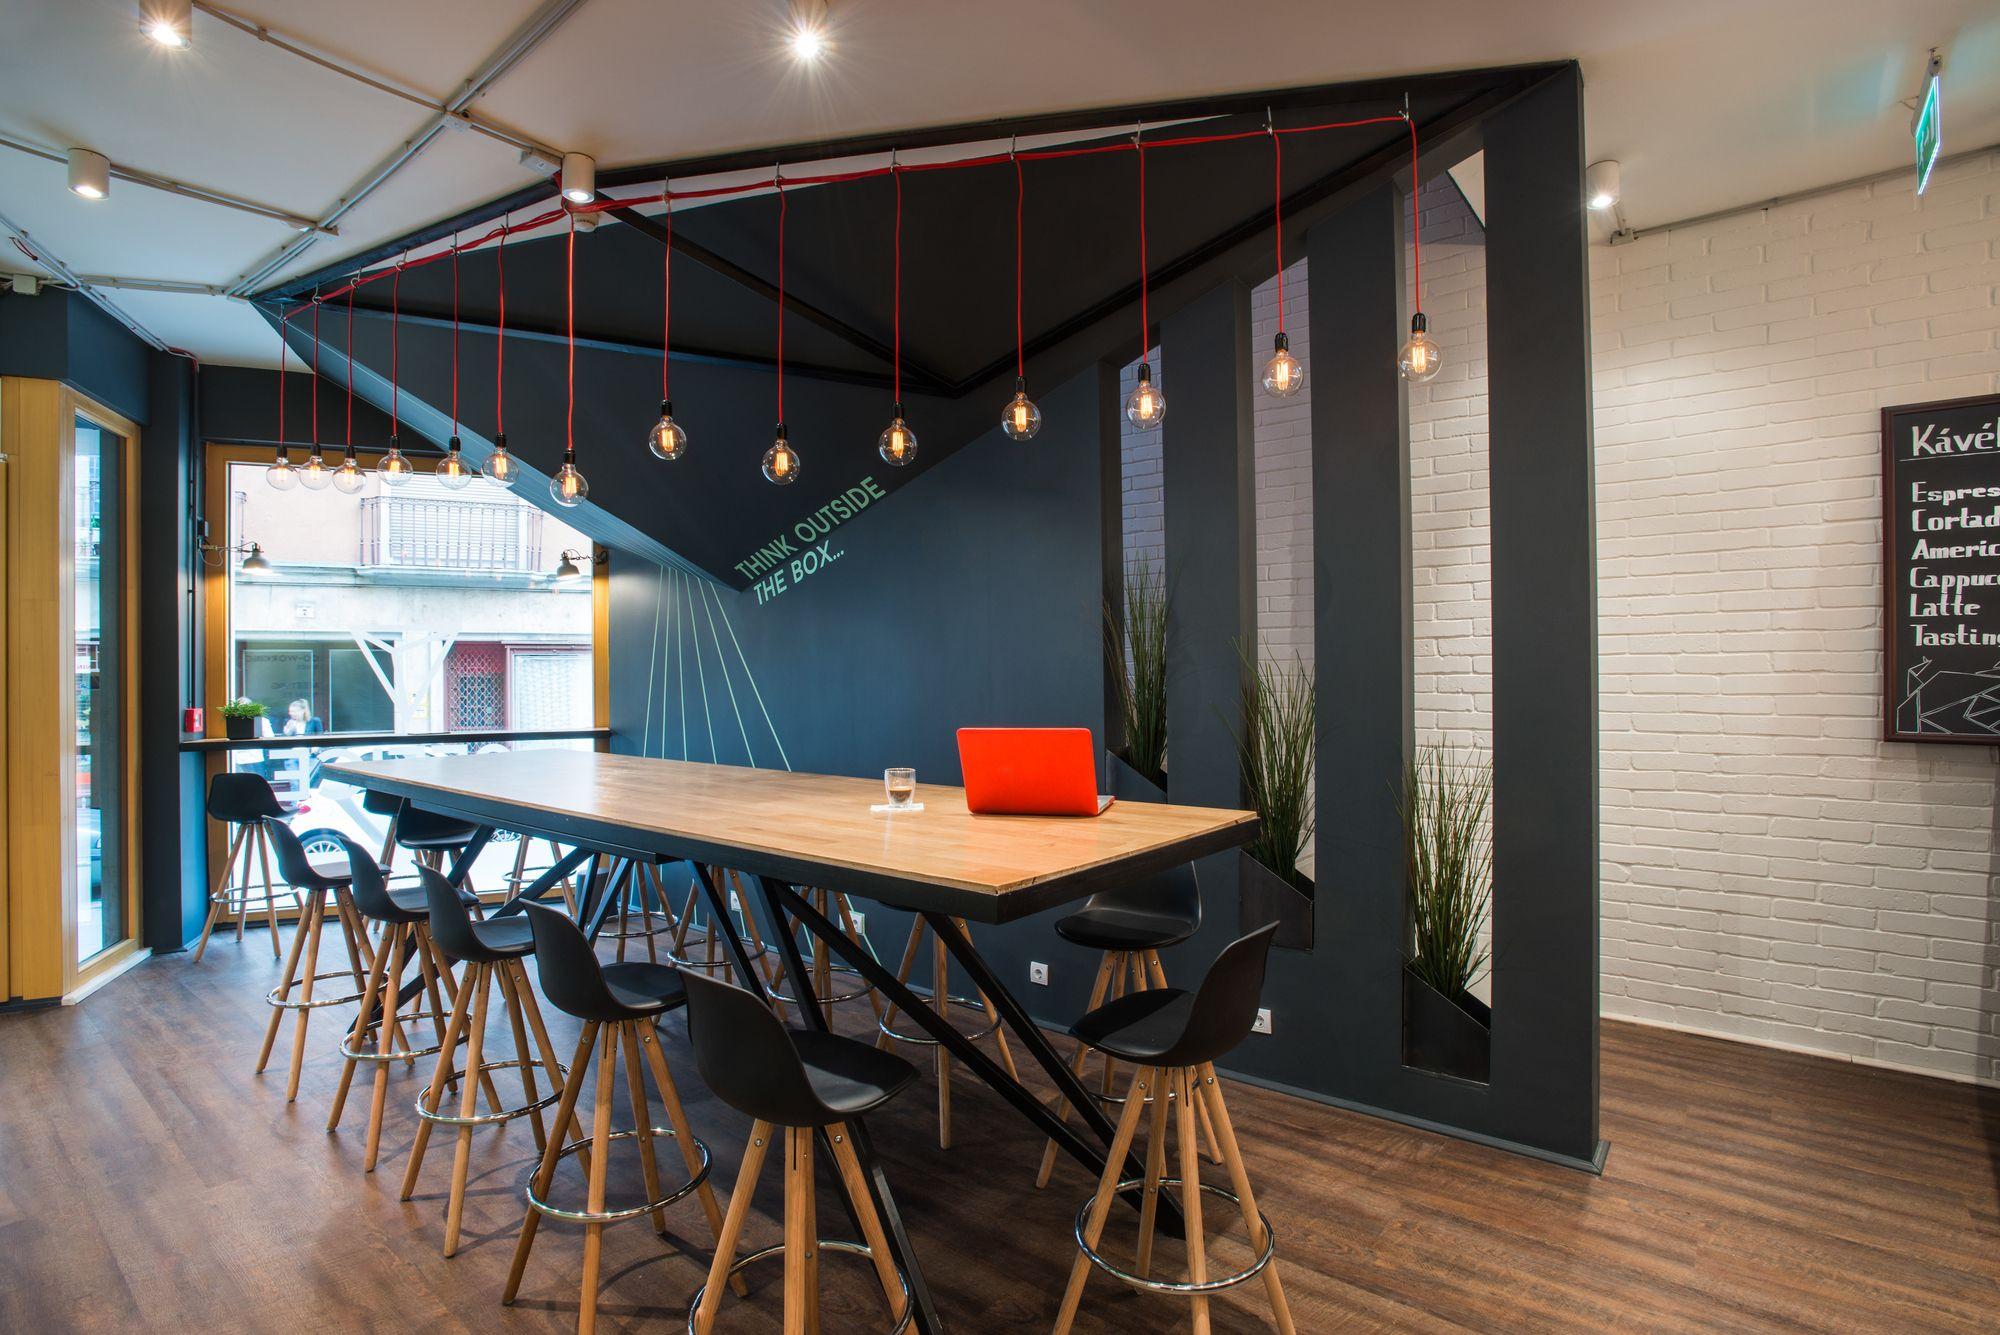 cafe restaurant - Multi Cafe Decoration